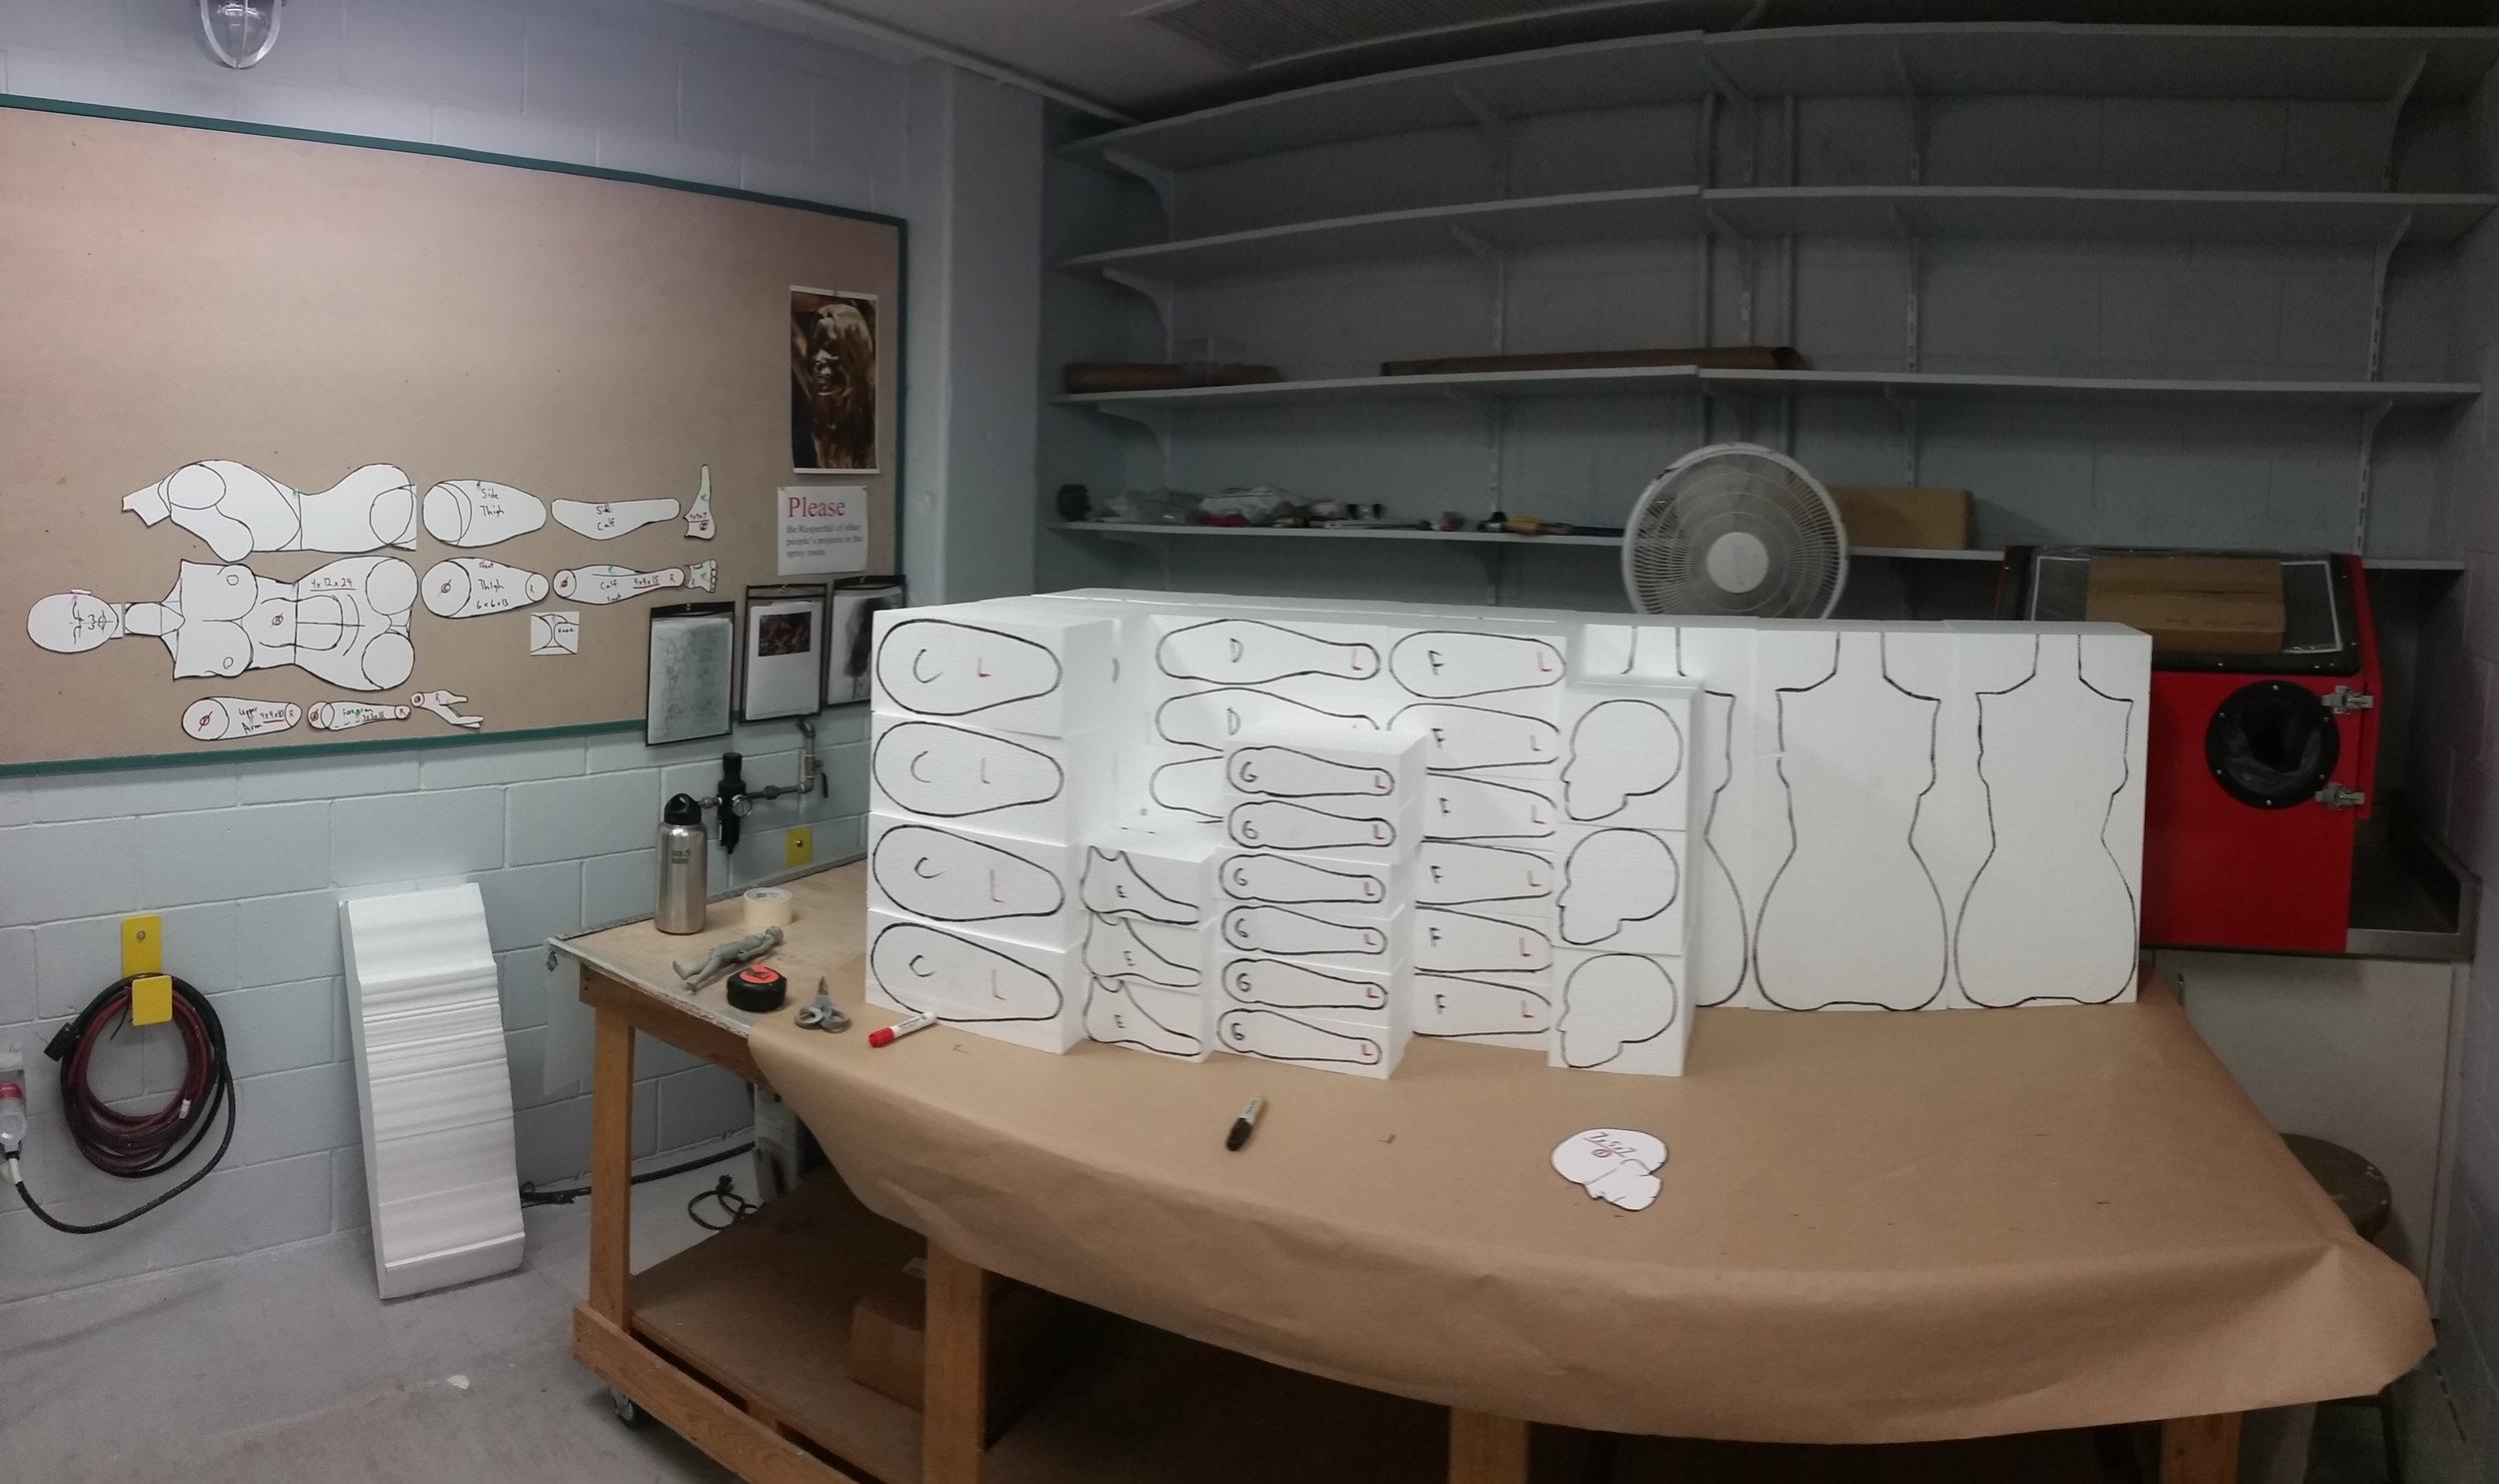 Pre-Carve Planning